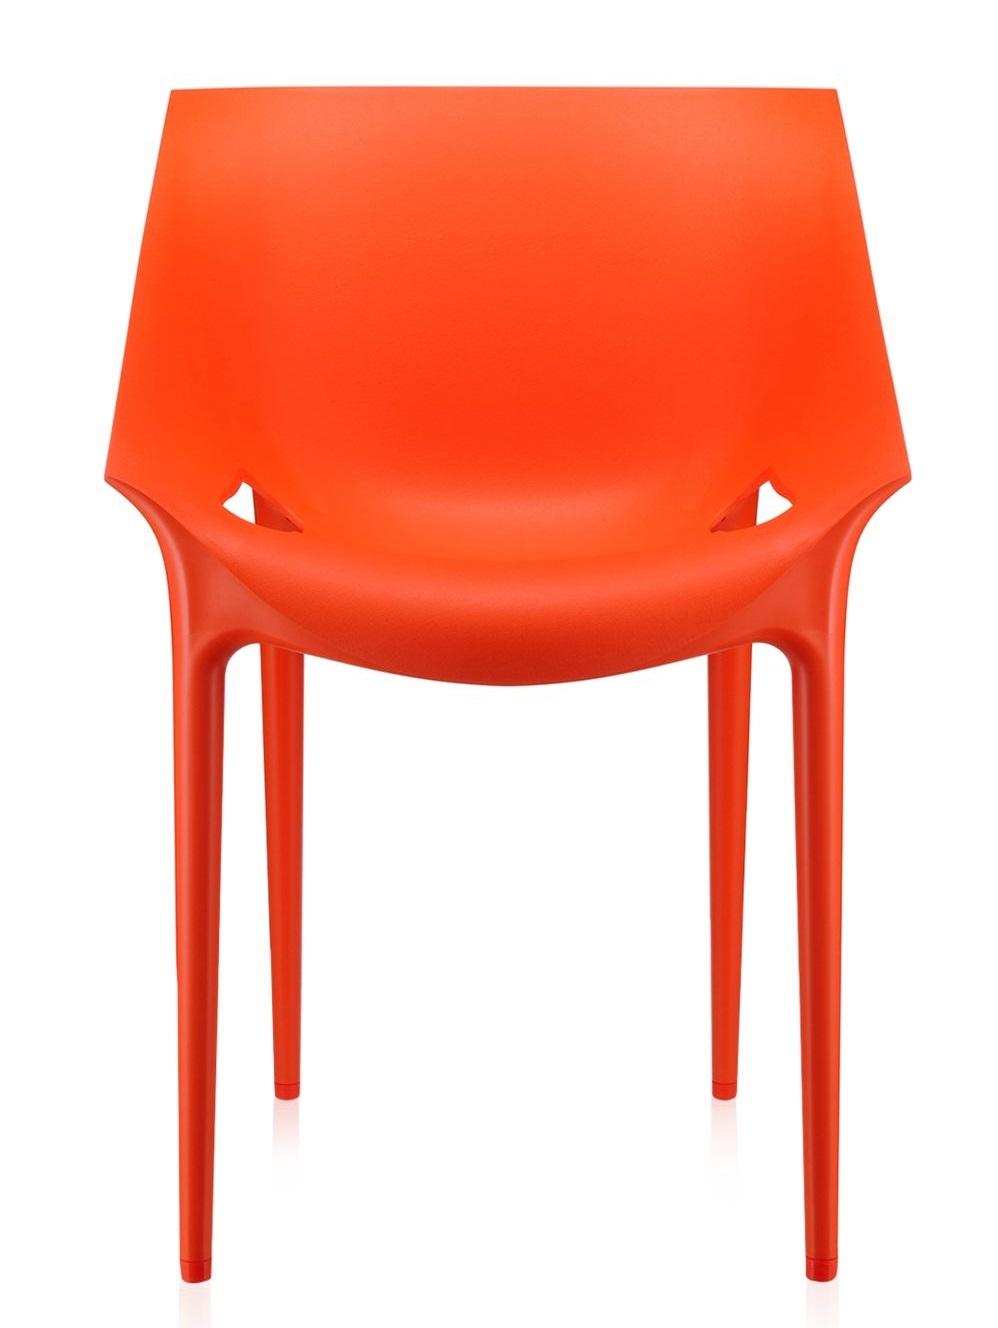 Scaun Kartell Dr. Yes design Philippe Starck & Eugeni Quitllet rosu-portocaliu